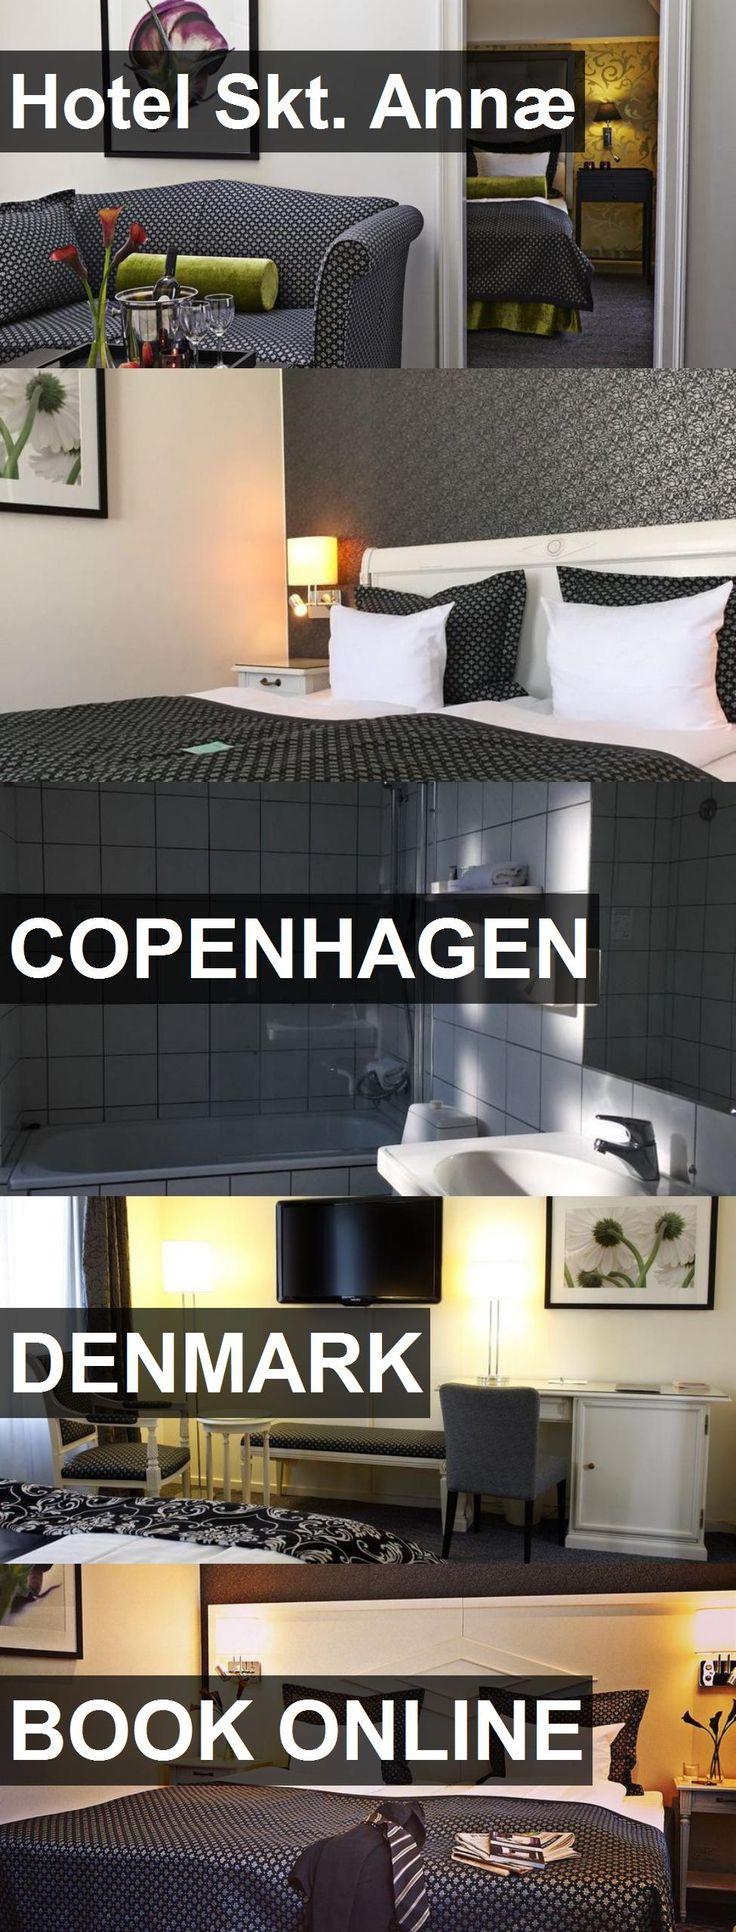 Hotel Skt. Annæ in Copenhagen, Denmark. For more information, photos, reviews and best prices please follow the link. #Denmark #Copenhagen #travel #vacation #hotel